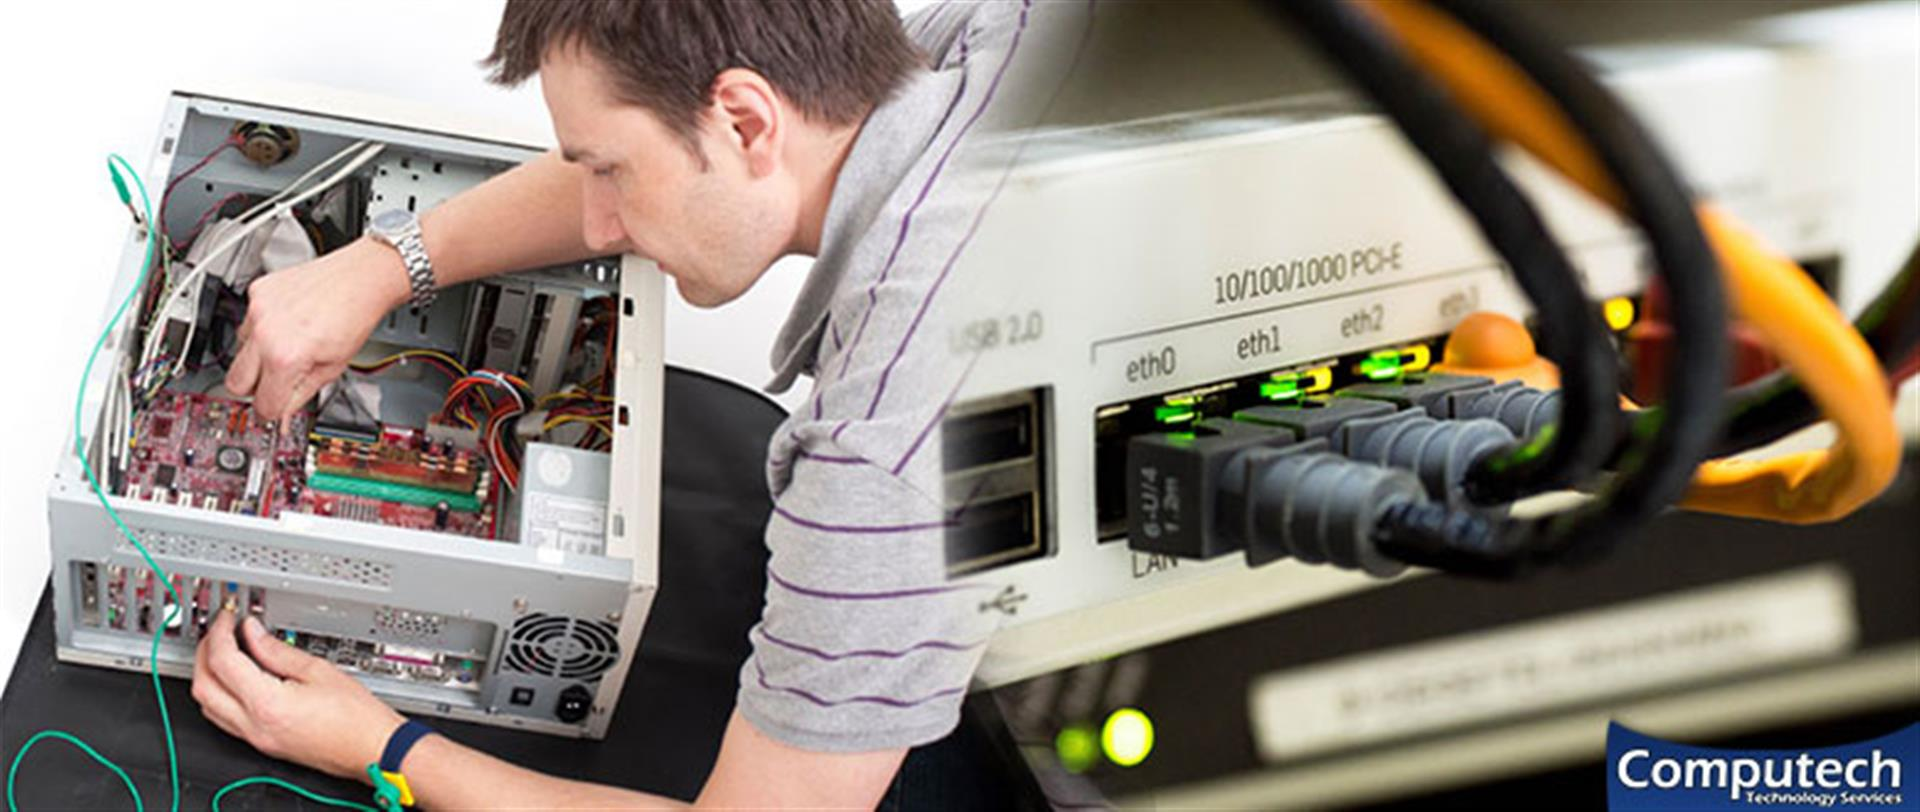 Bridgewater Virginia Onsite Computer PC & Printer Repairs, Network, Voice & Data Cabling Services